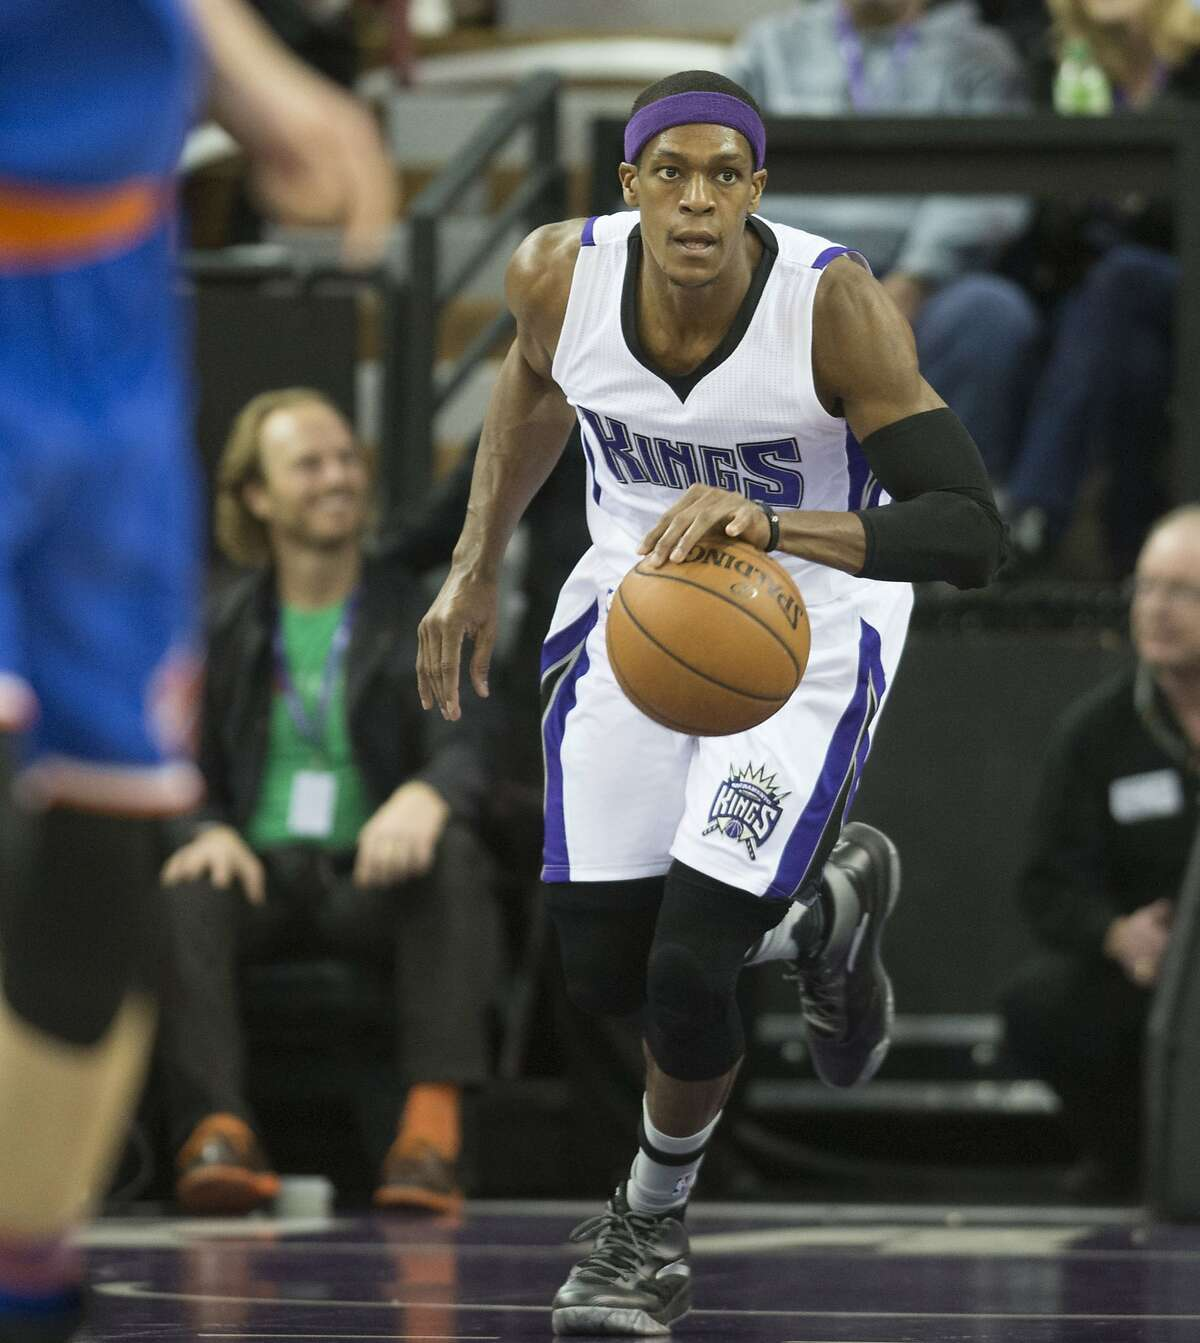 The Sacramento Kings' Rajon Rondo (9) drives down court against the New York Knicks at Sleep Train Arena in Sacramento, Calif., on Thursday, Dec. 10, 2015. (Hector Amezcua/Sacramento Bee/TNS)